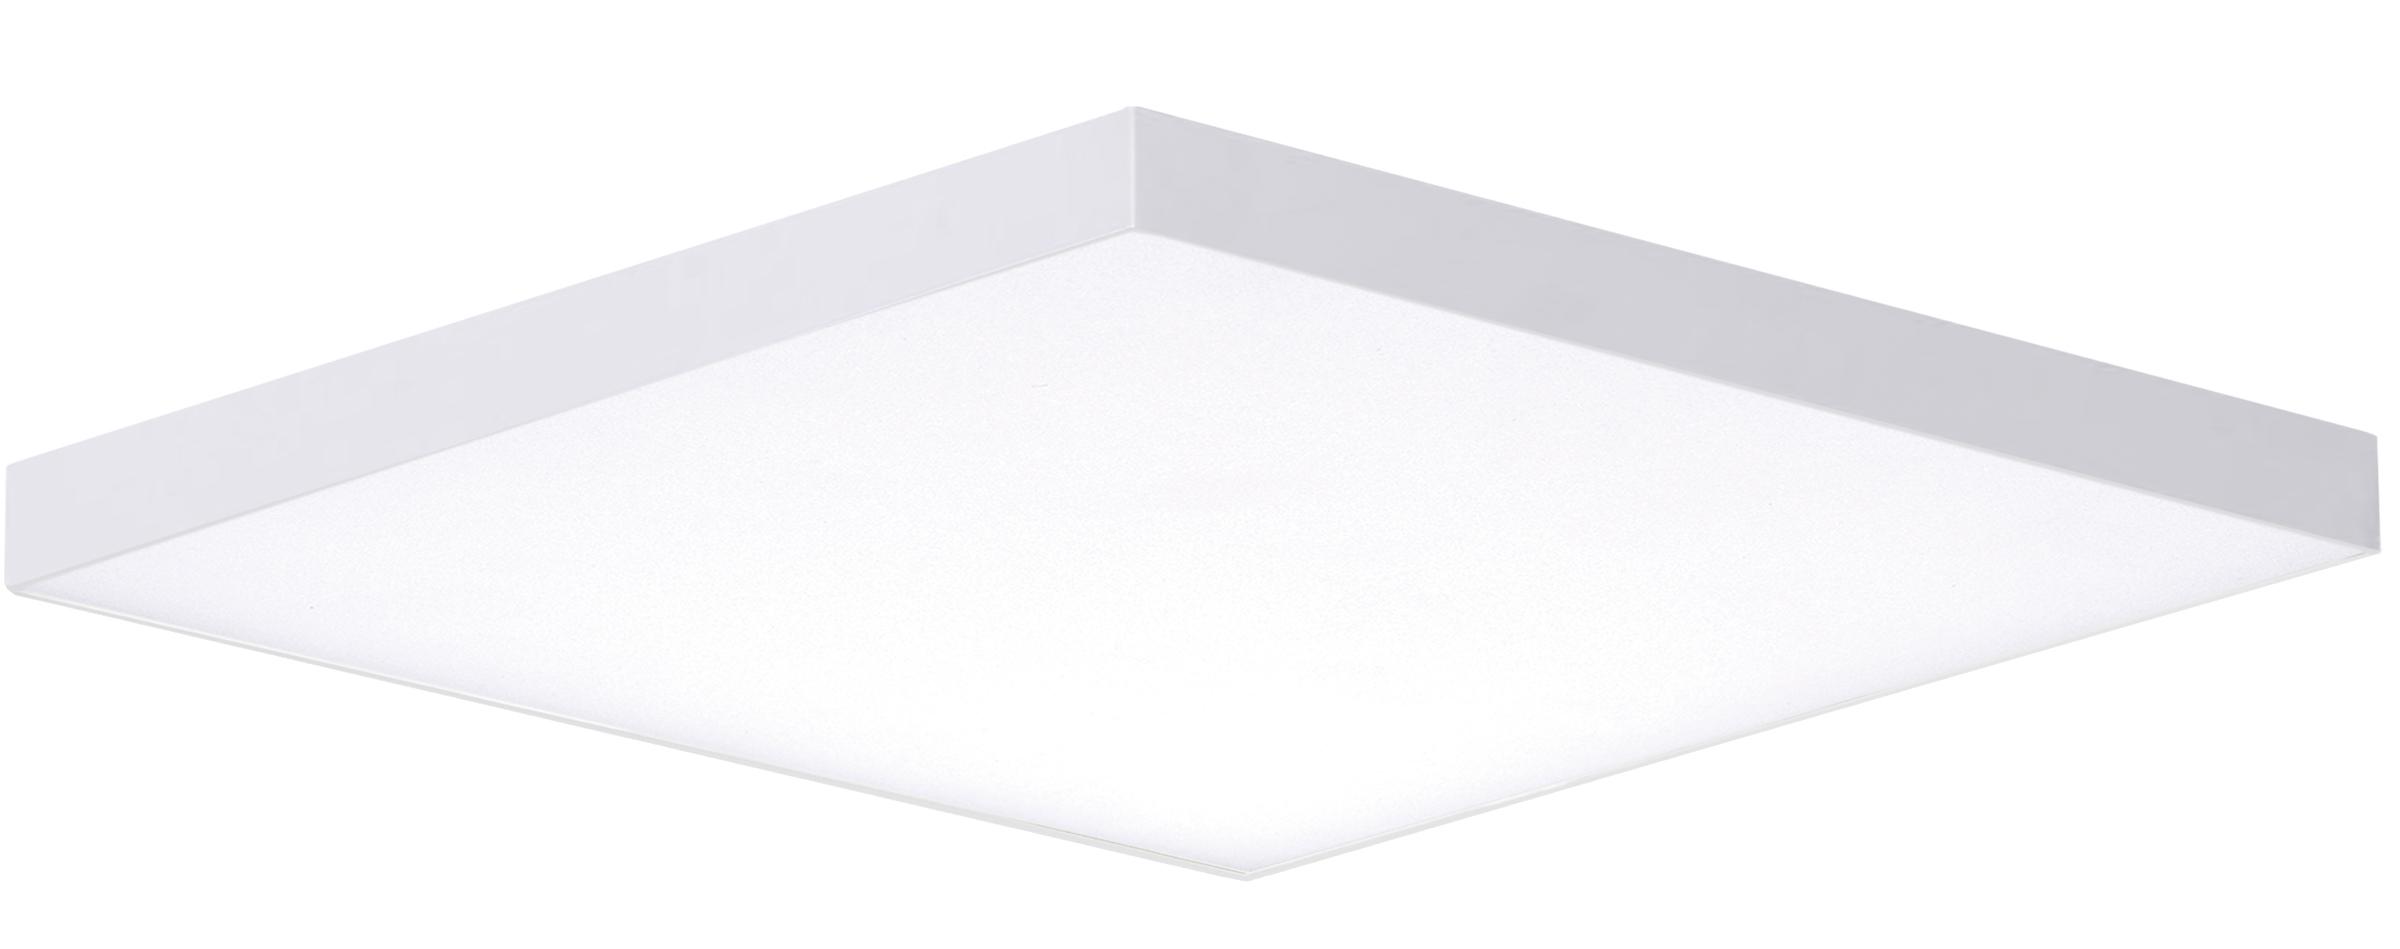 Trim 15.5-inch Square LED Flush Mount 3000K | Maxim Lighting